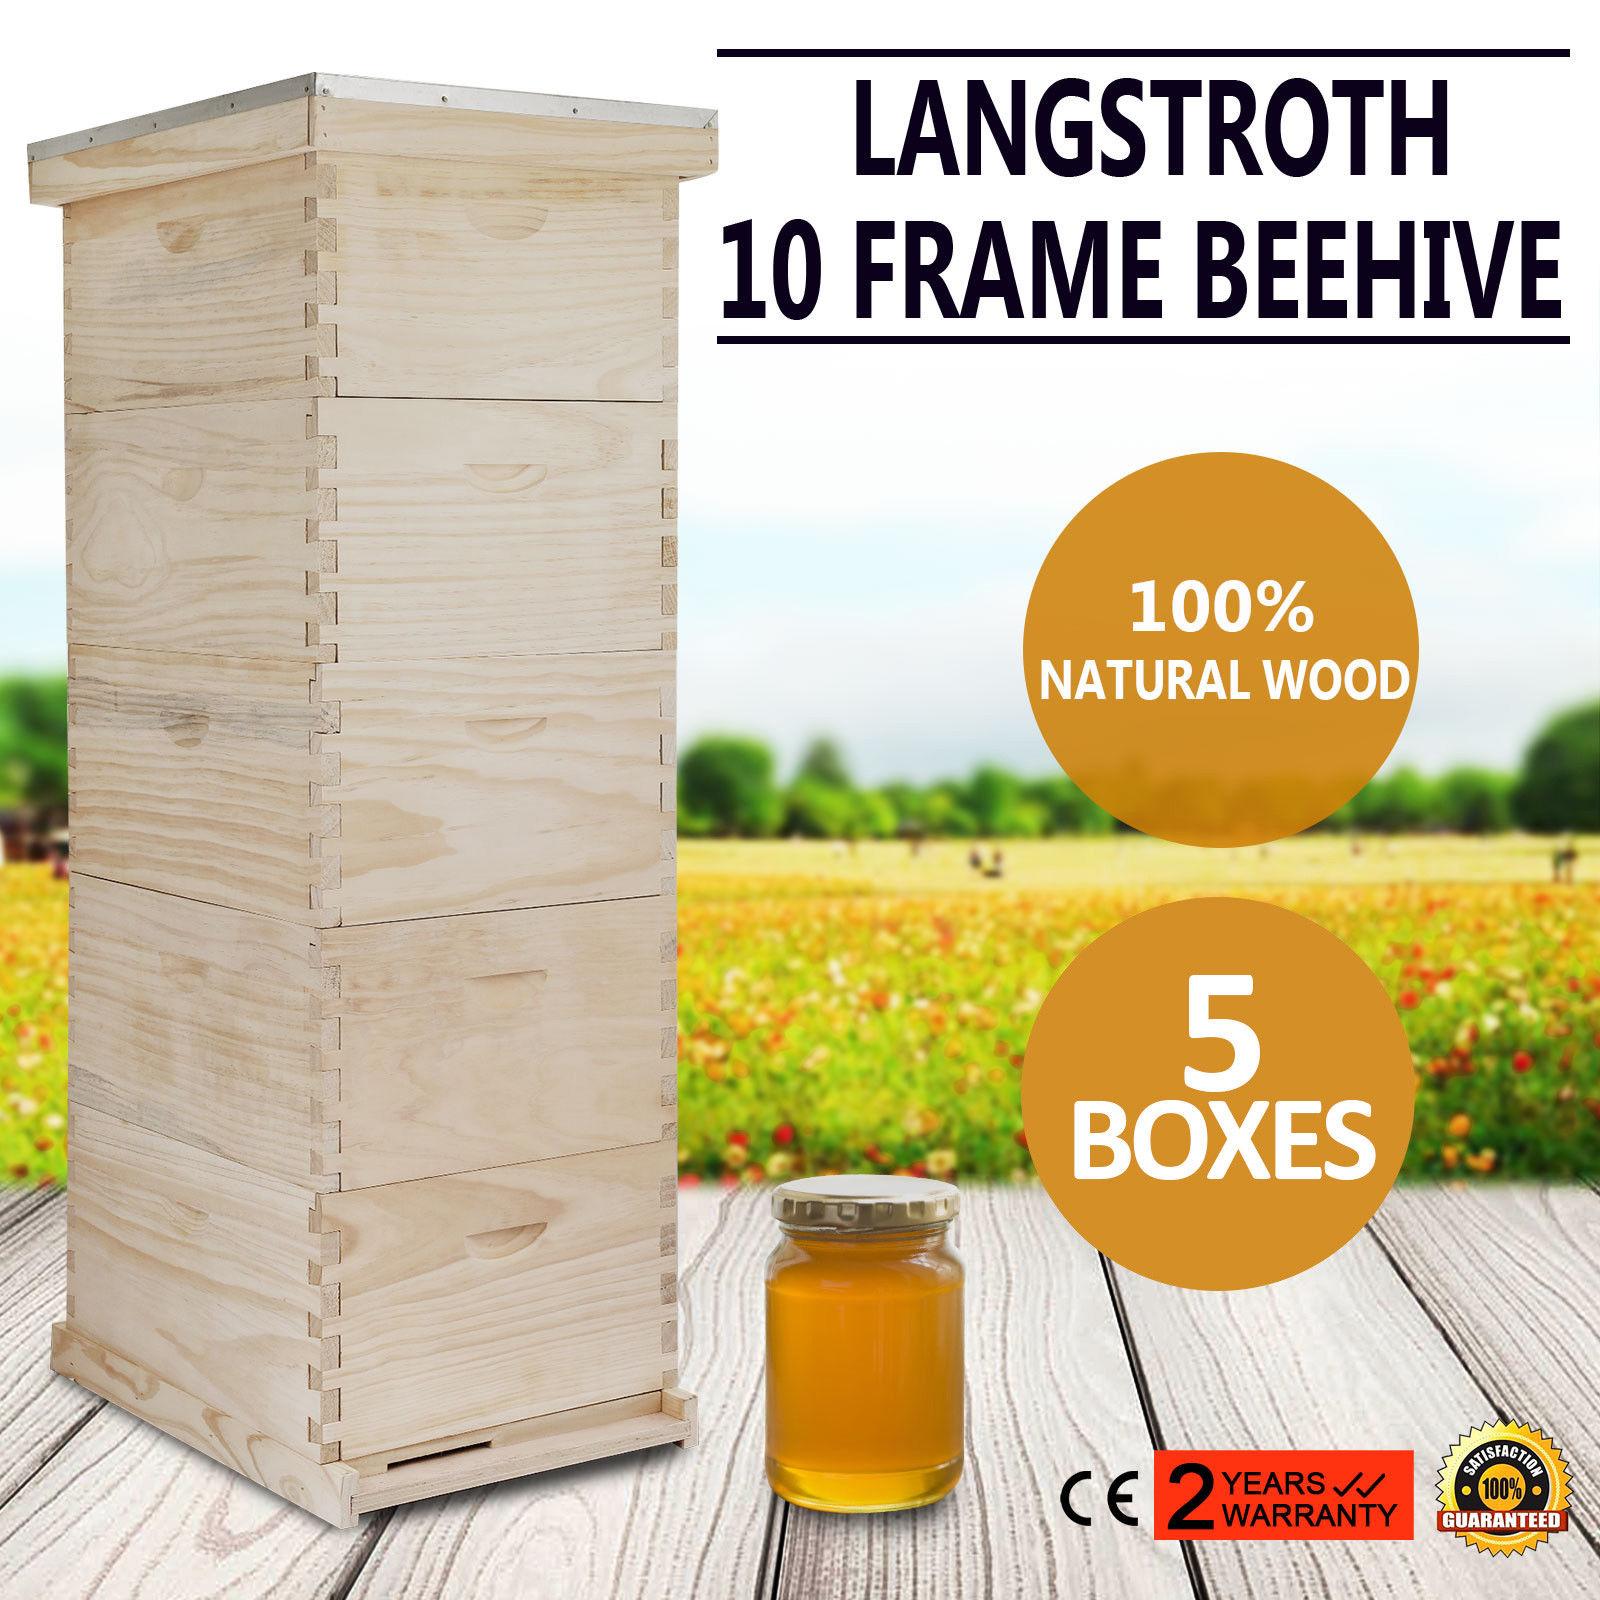 Free Shipping Bee Hive 10 Frame 5 Box Beekeeping Kit Honey Bee Hive Metal Roof